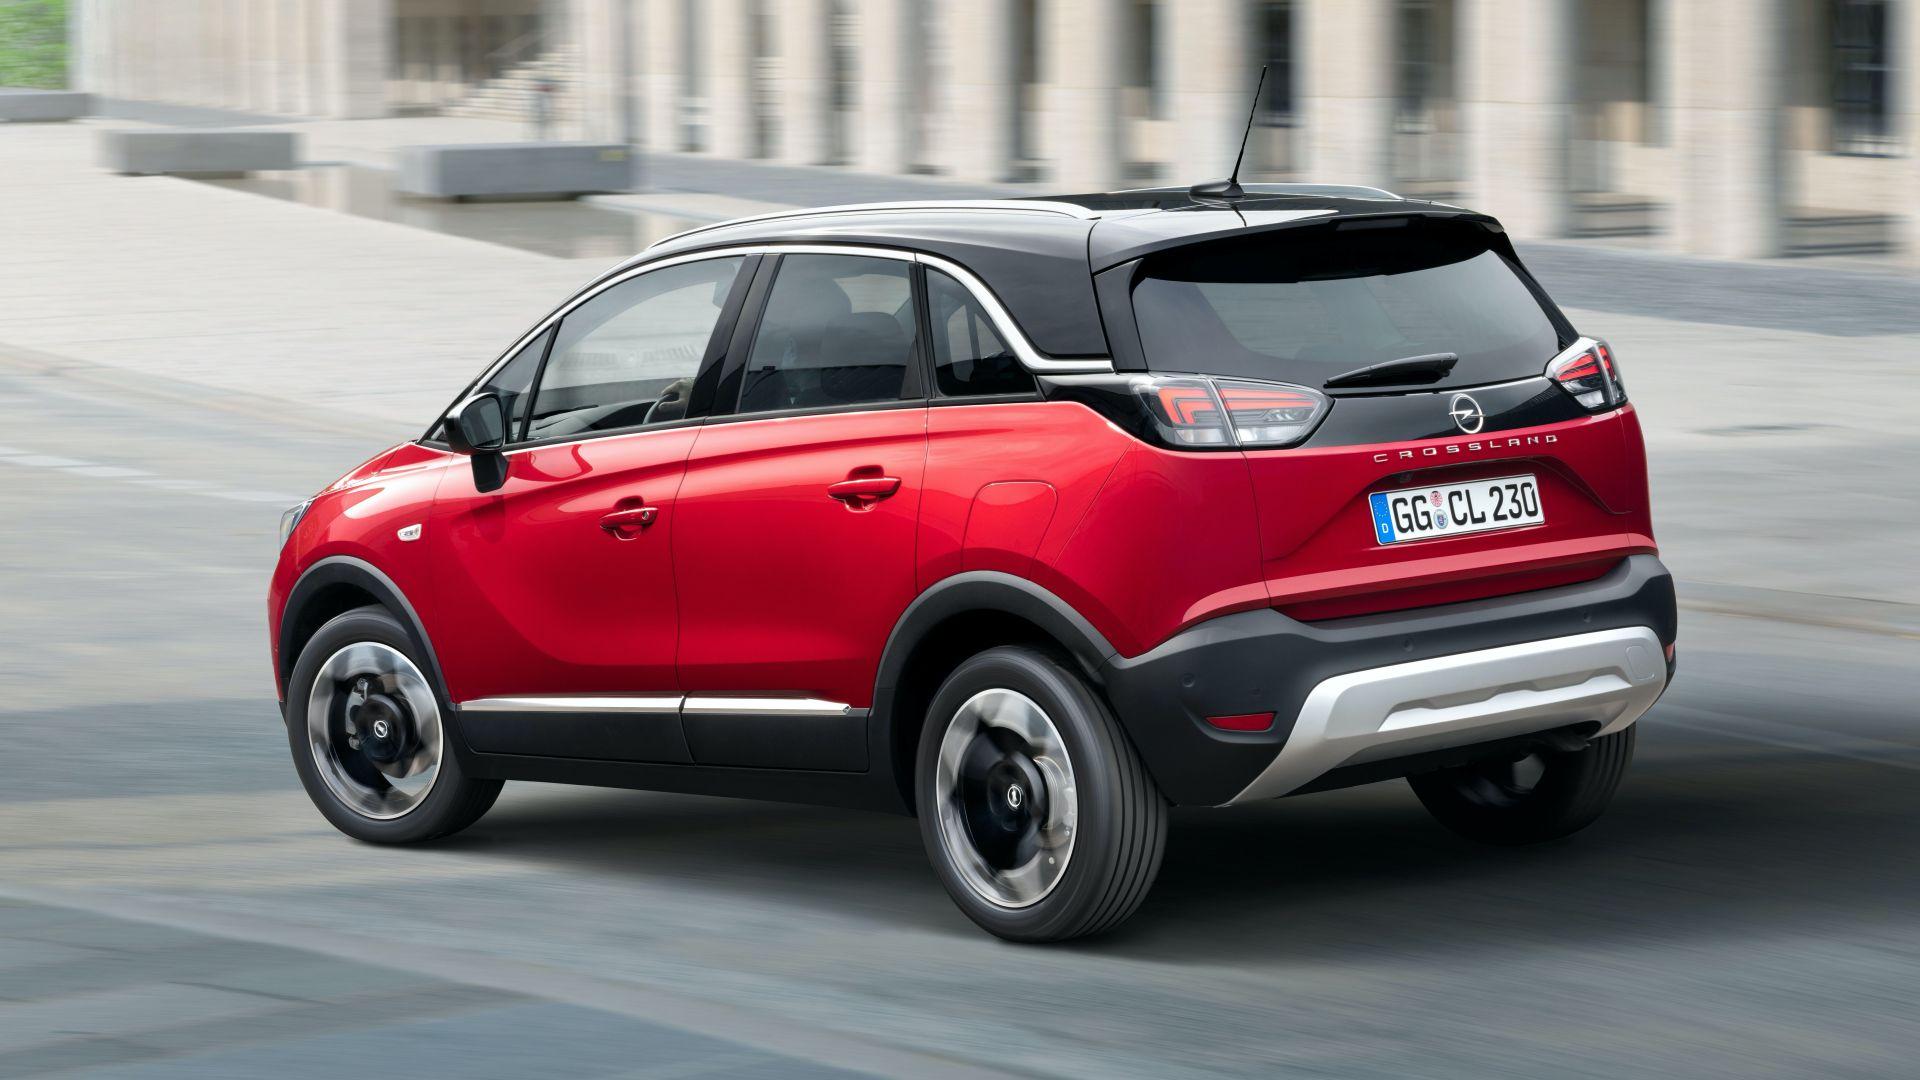 https://www.carscoops.com/wp-content/uploads/2020/10/2021-Opel-Crossland-facelift-4.jpg